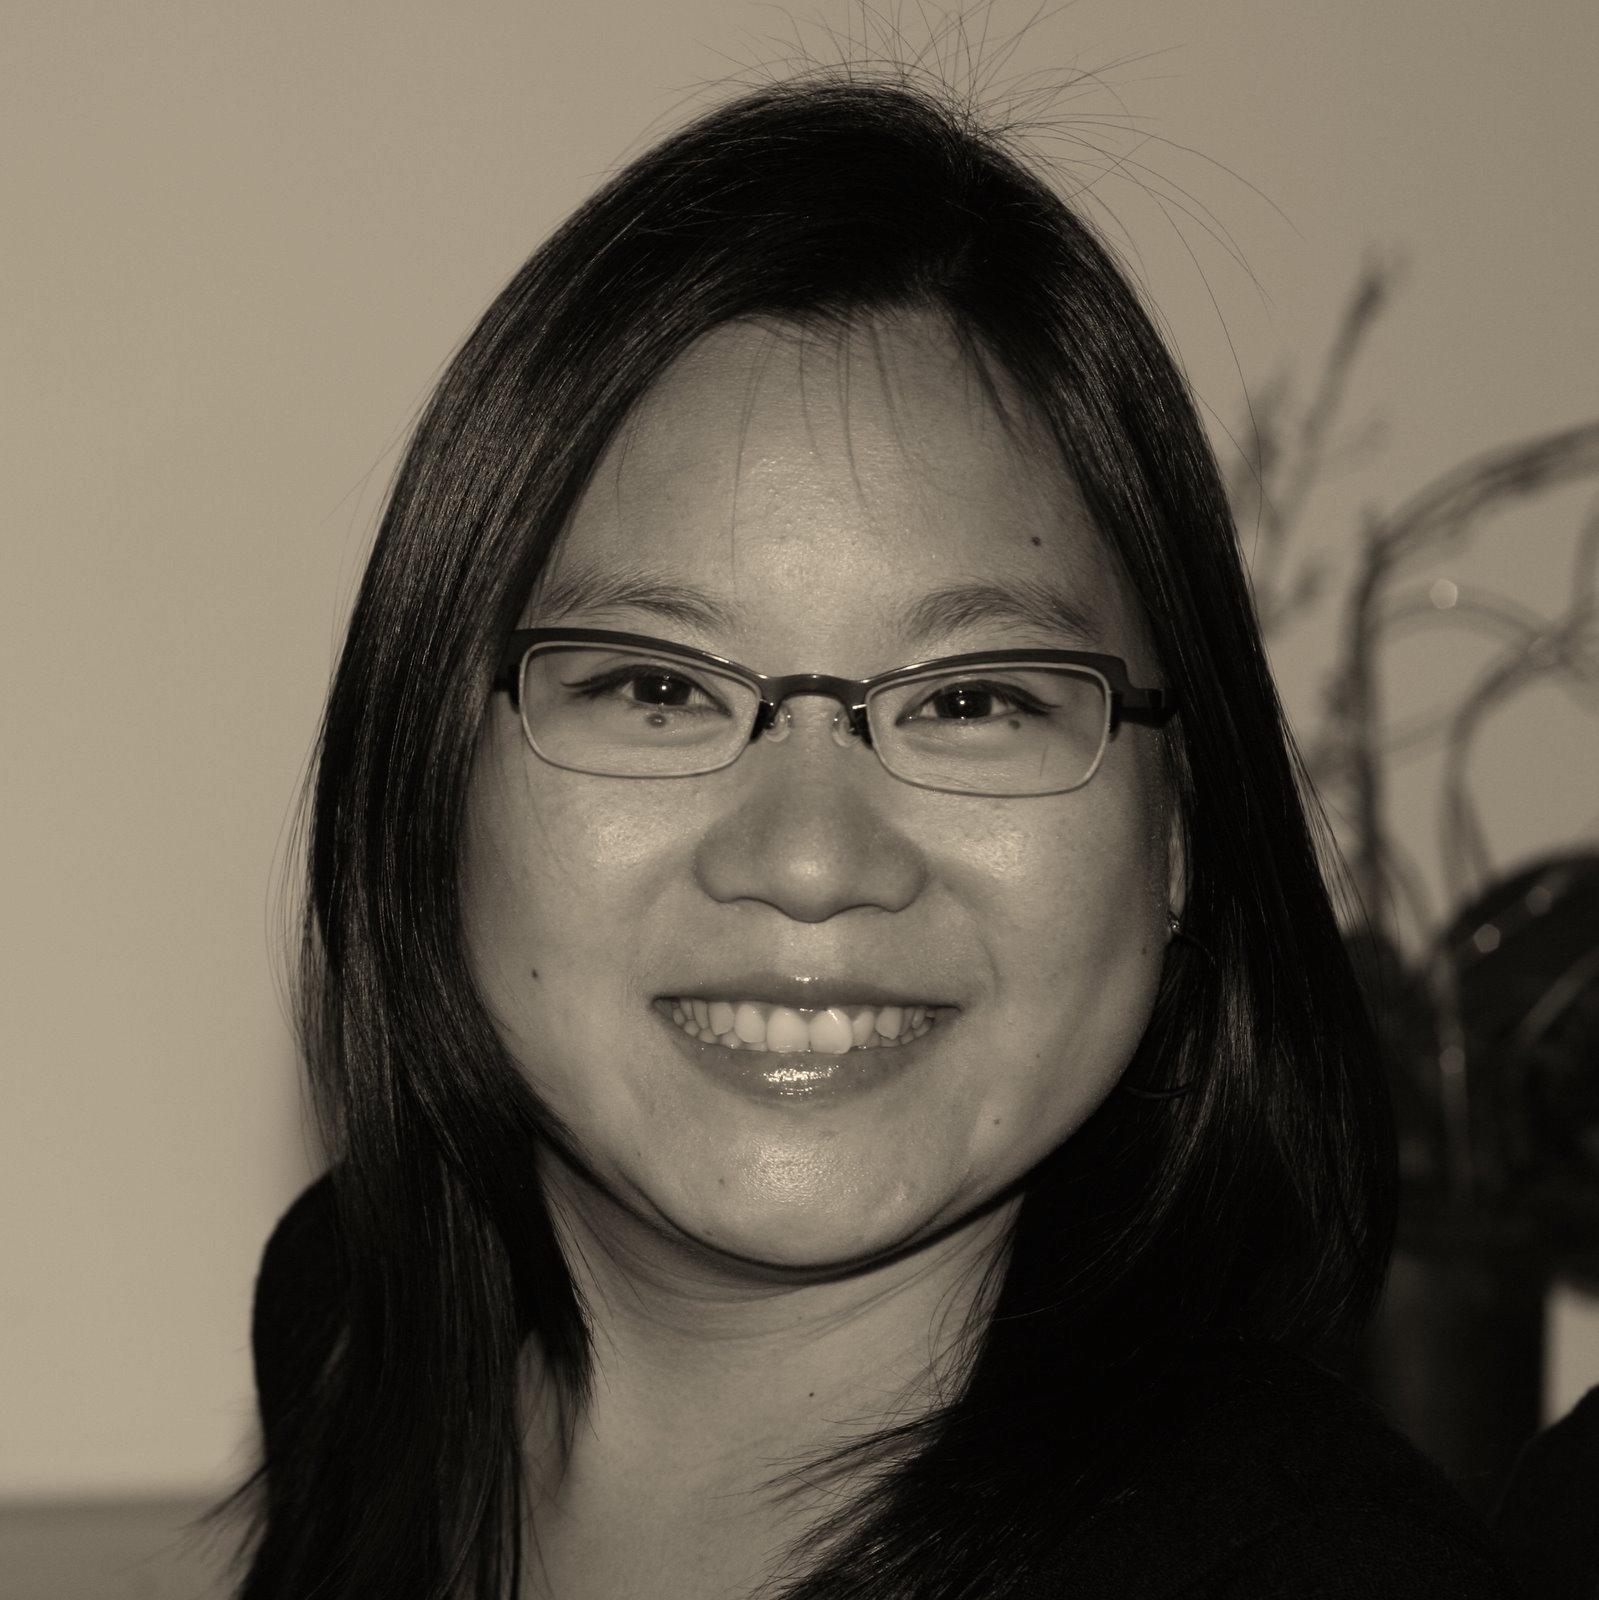 Julie Lam-Perocheau   Julie.Lam.Perocheau@gmail.com      06 01 31 58 36